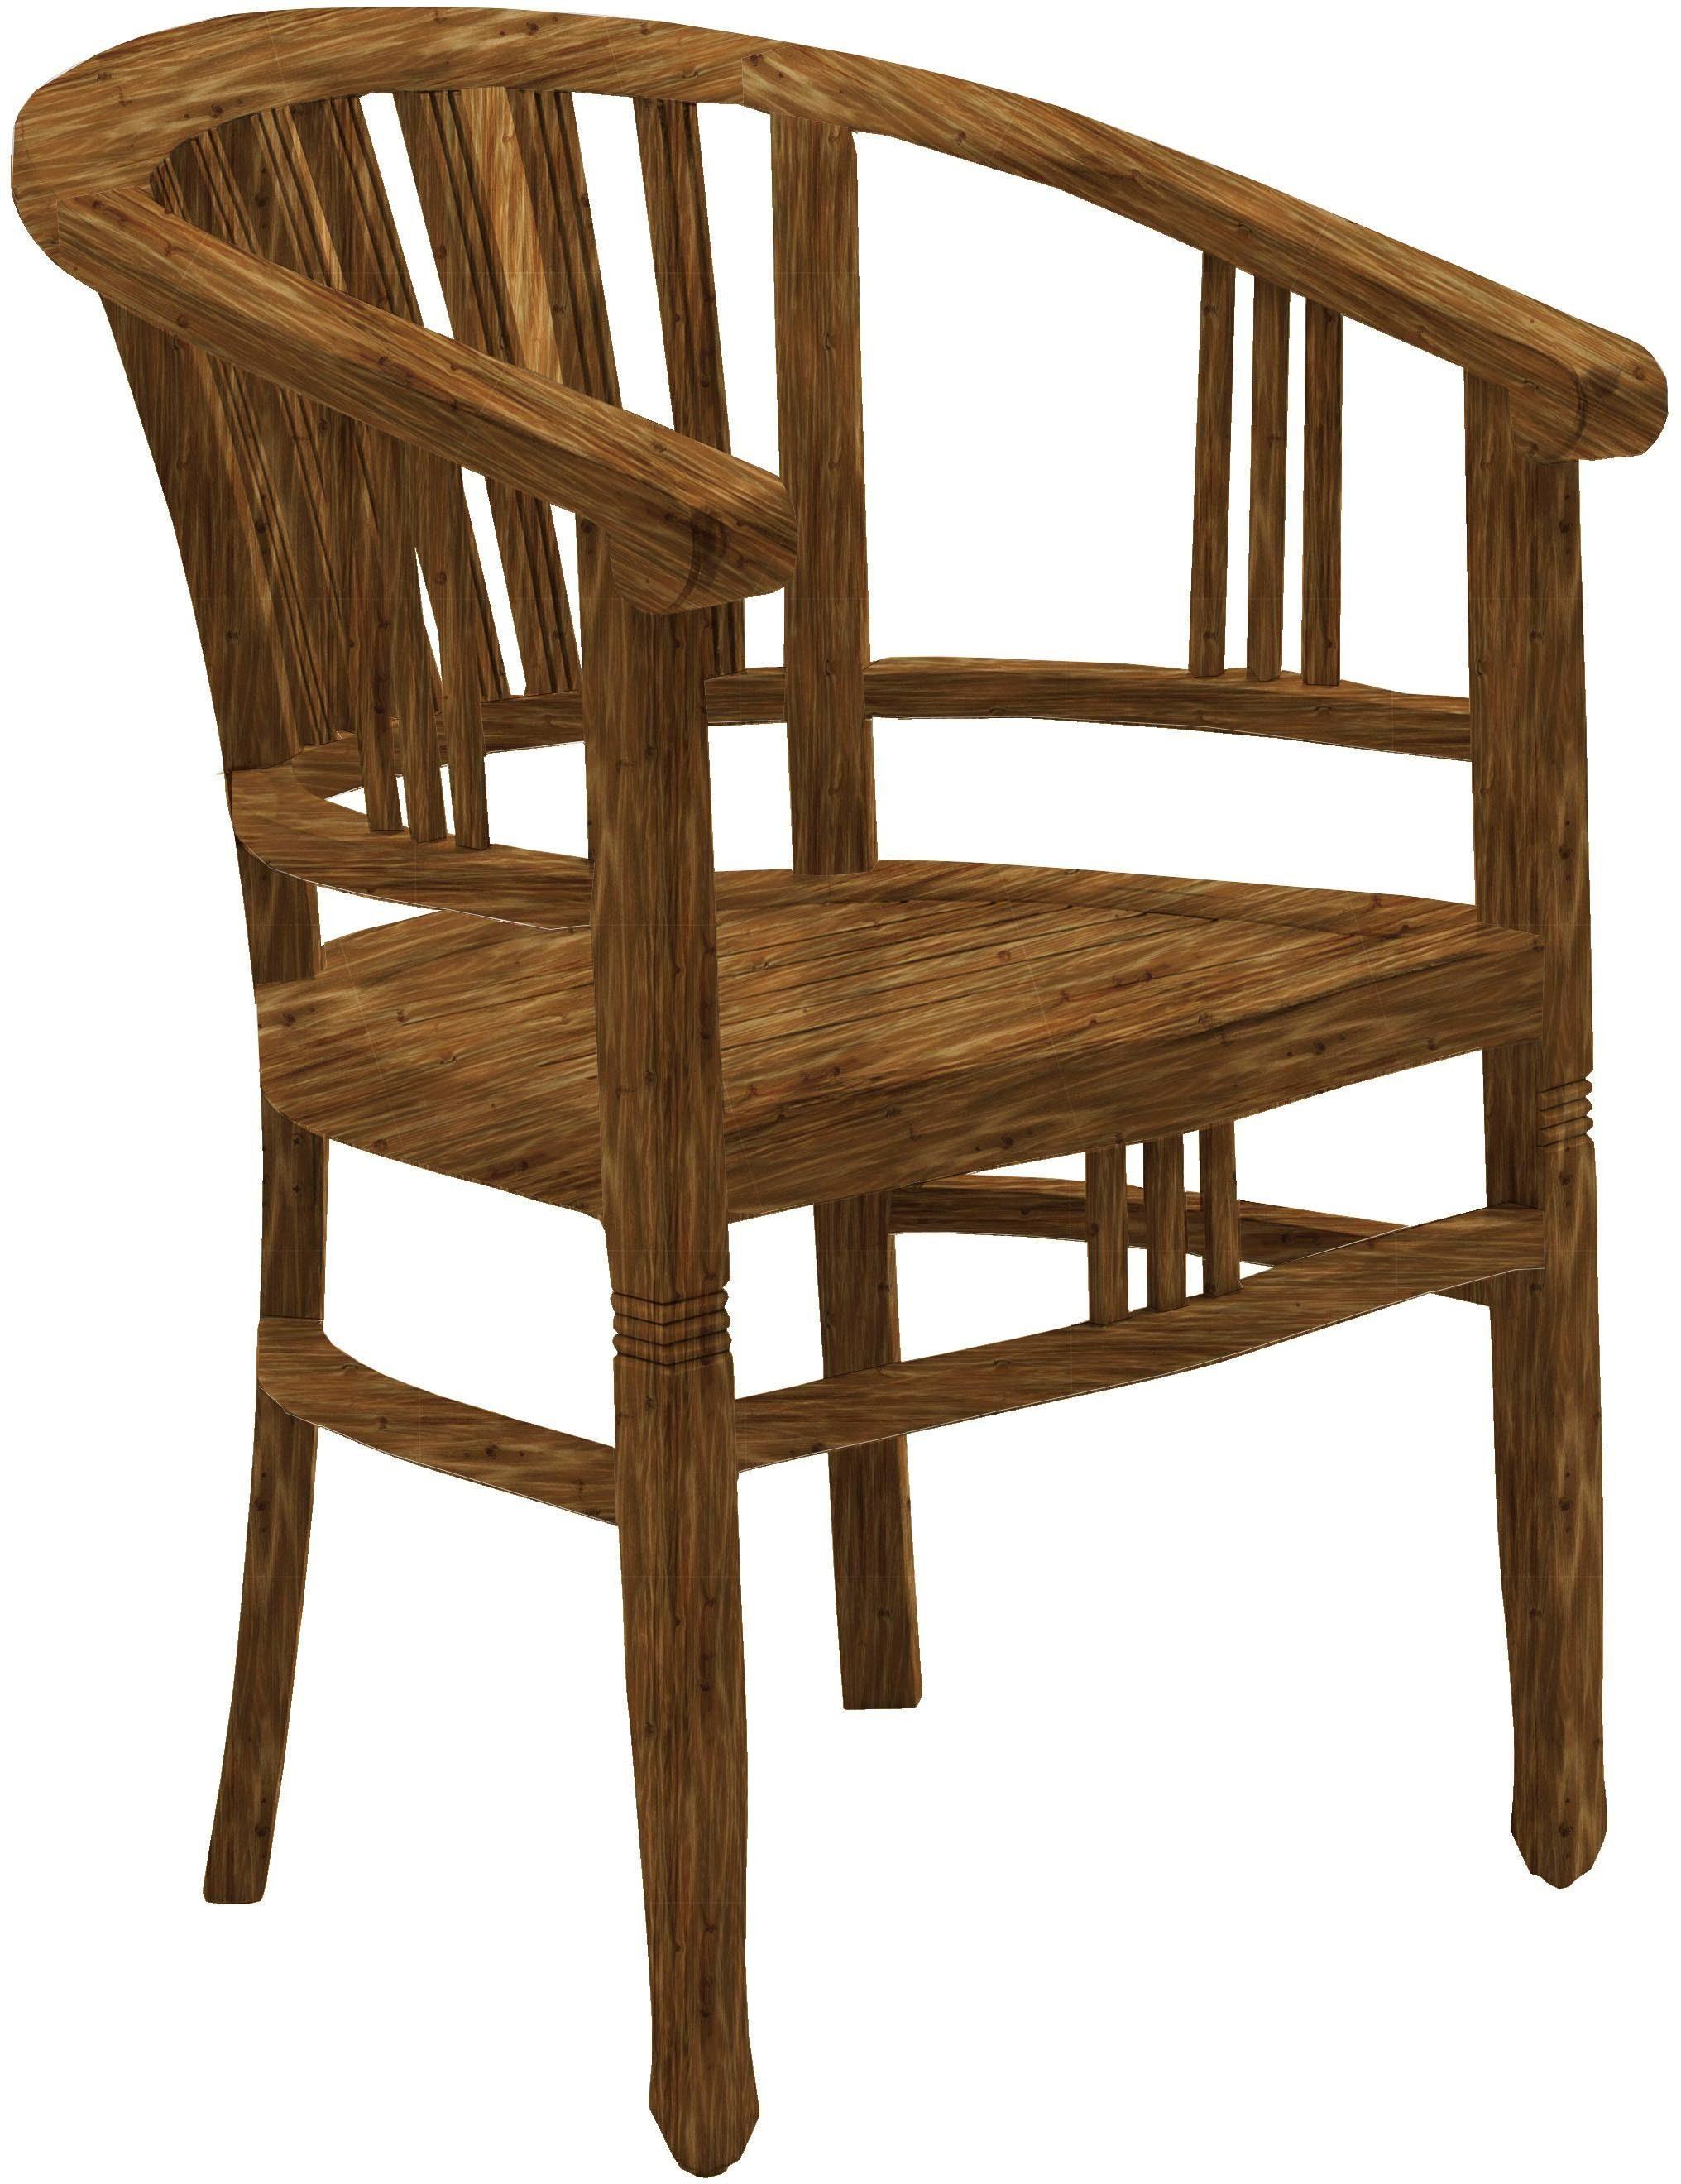 SIT Armlehnstuhl »Coral« aus recyceltem Teak-Altholz